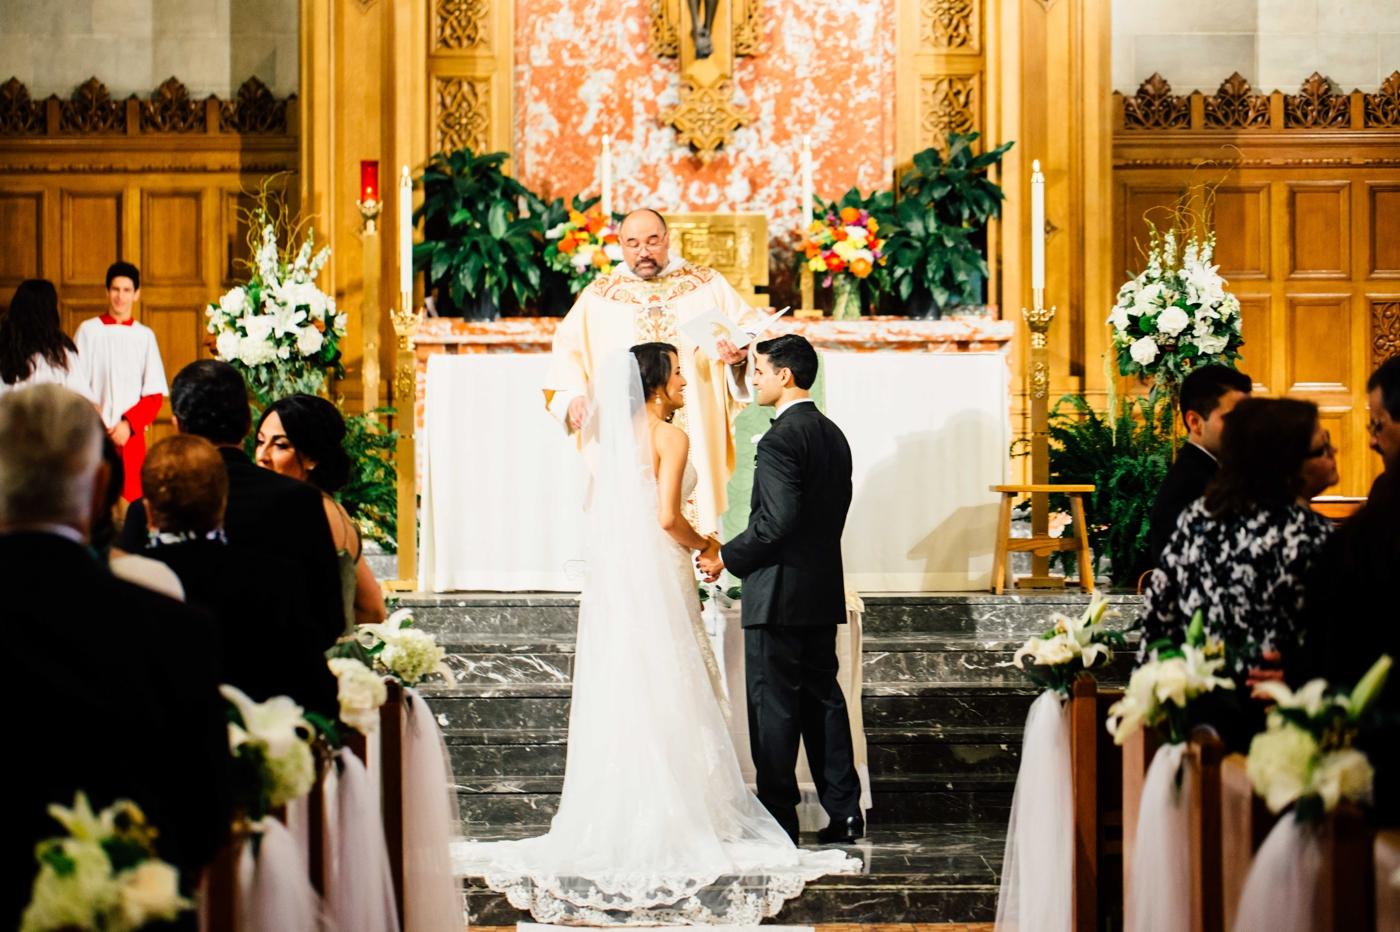 chicago-fine-art-wedding-photography-alfano8